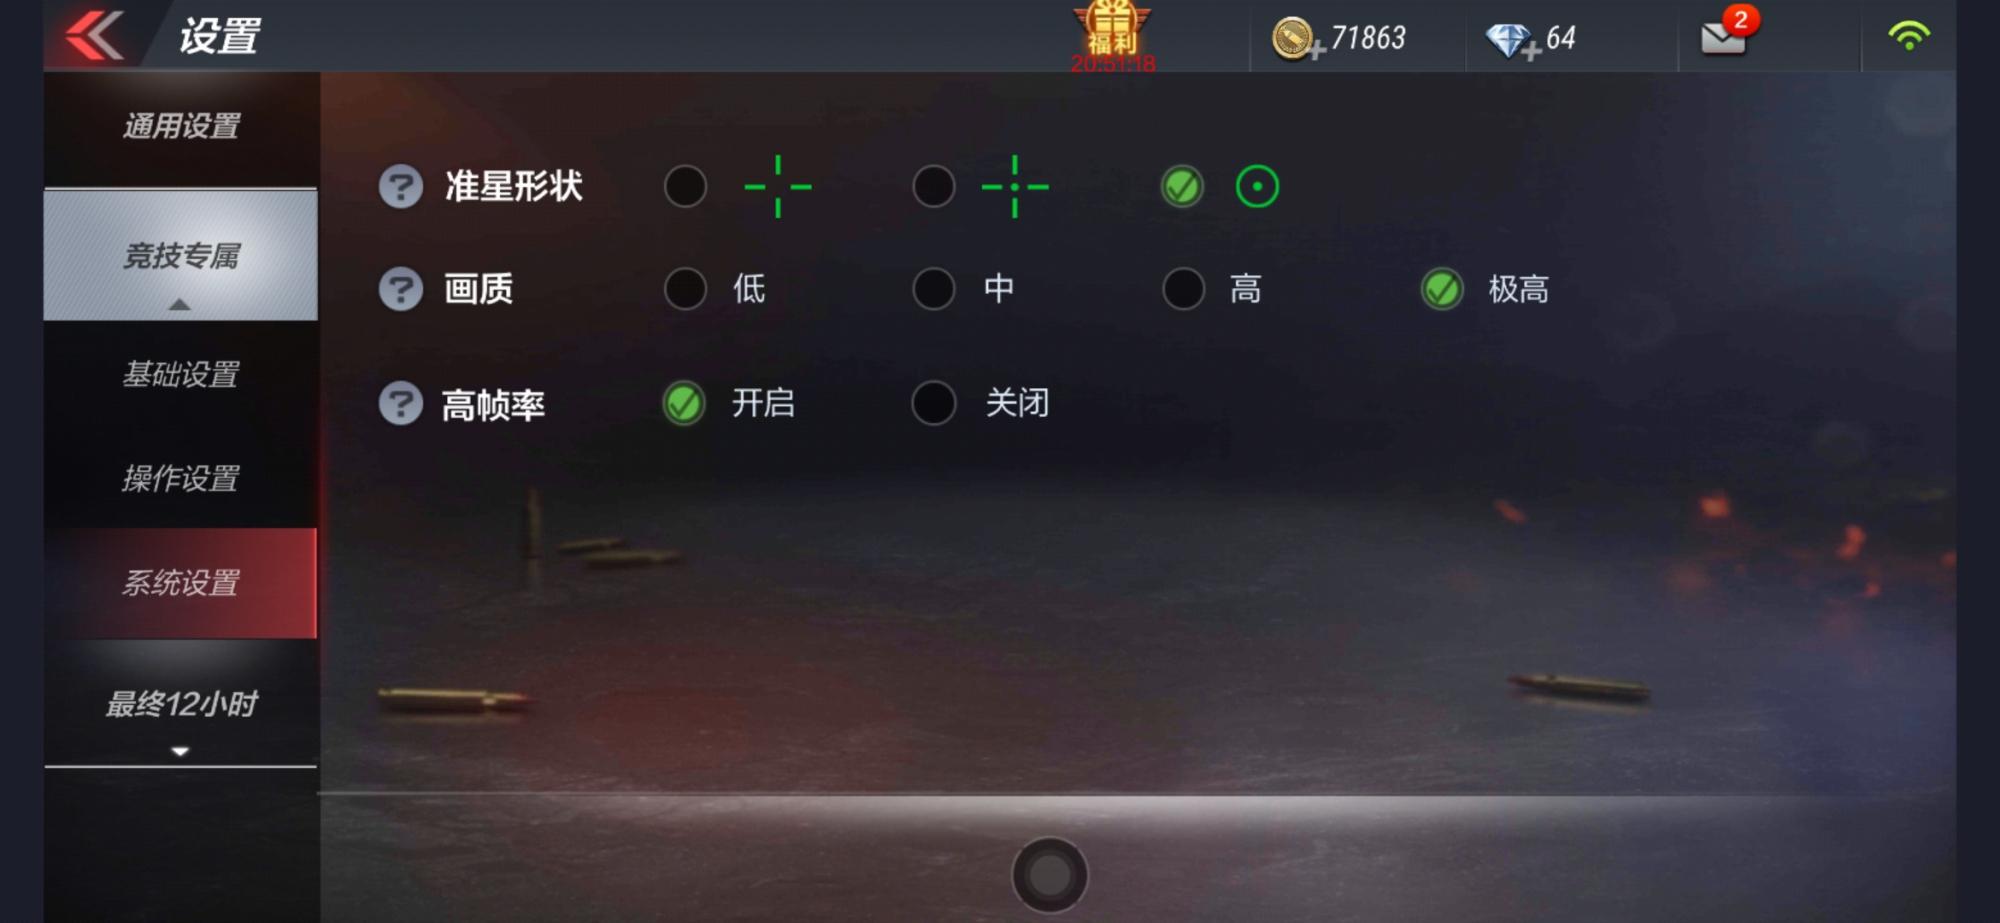 Screenshot_20190714_151445_com.tencent.tmgp.cf.jpg